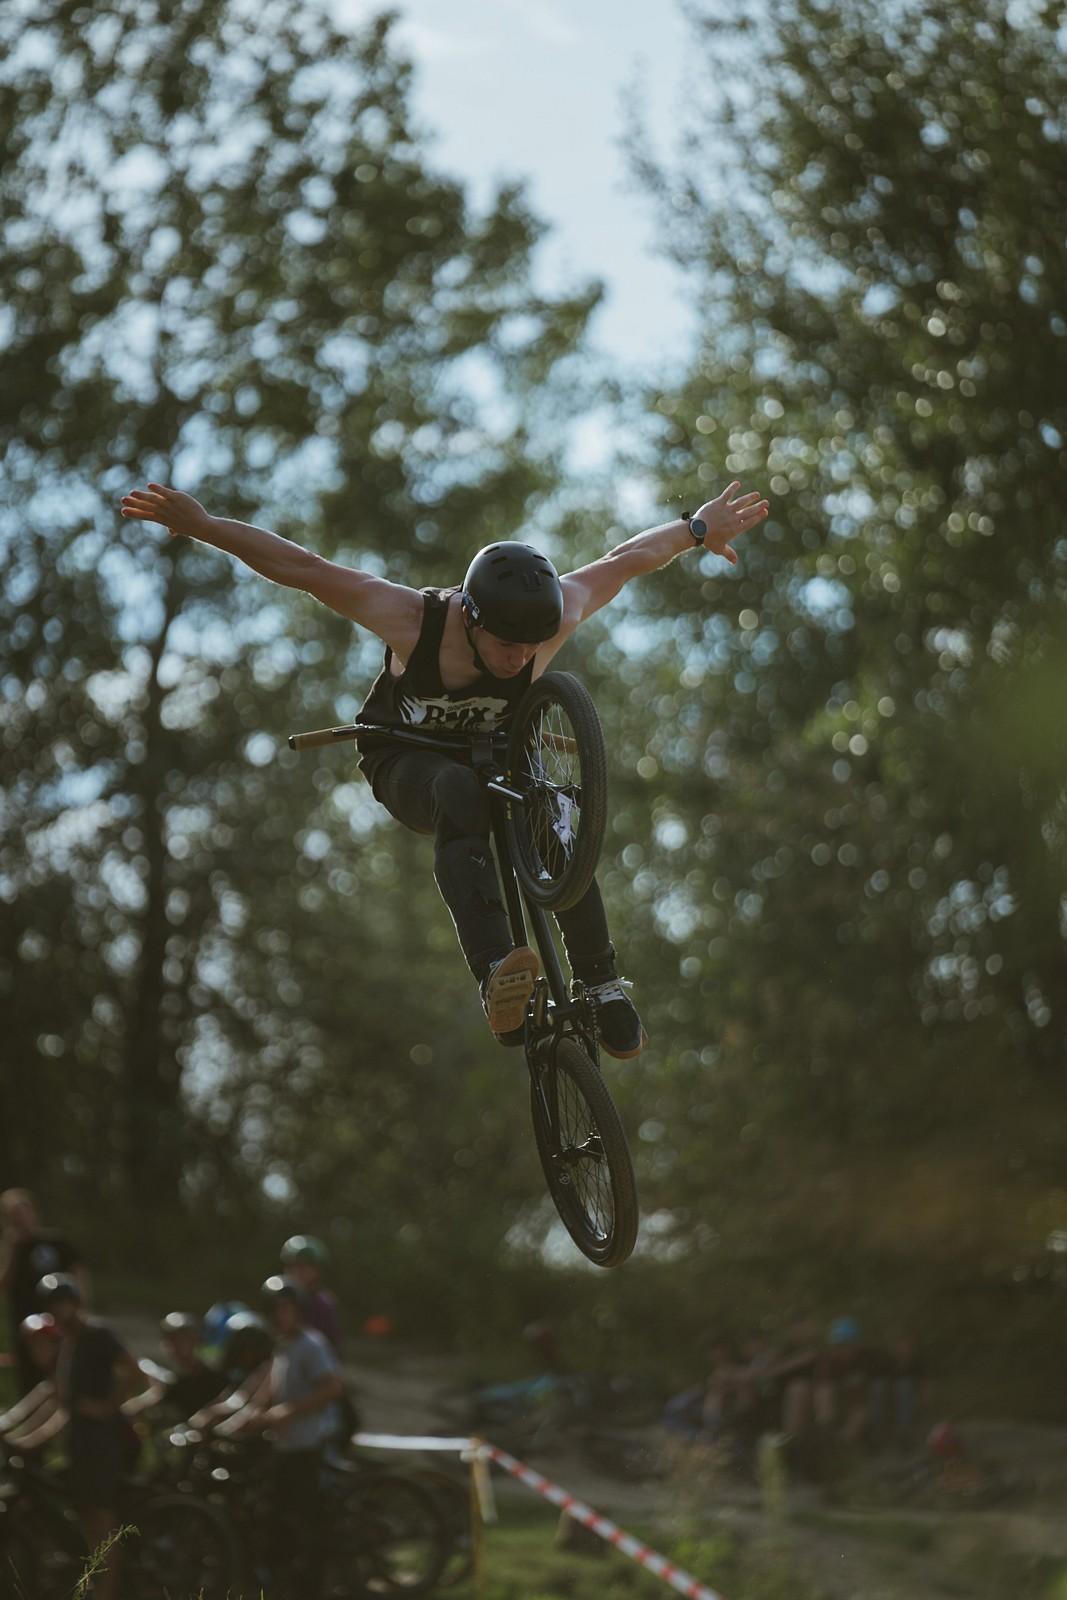 Look mum, no hands! - Paatrykk - Mountain Biking Pictures - Vital MTB